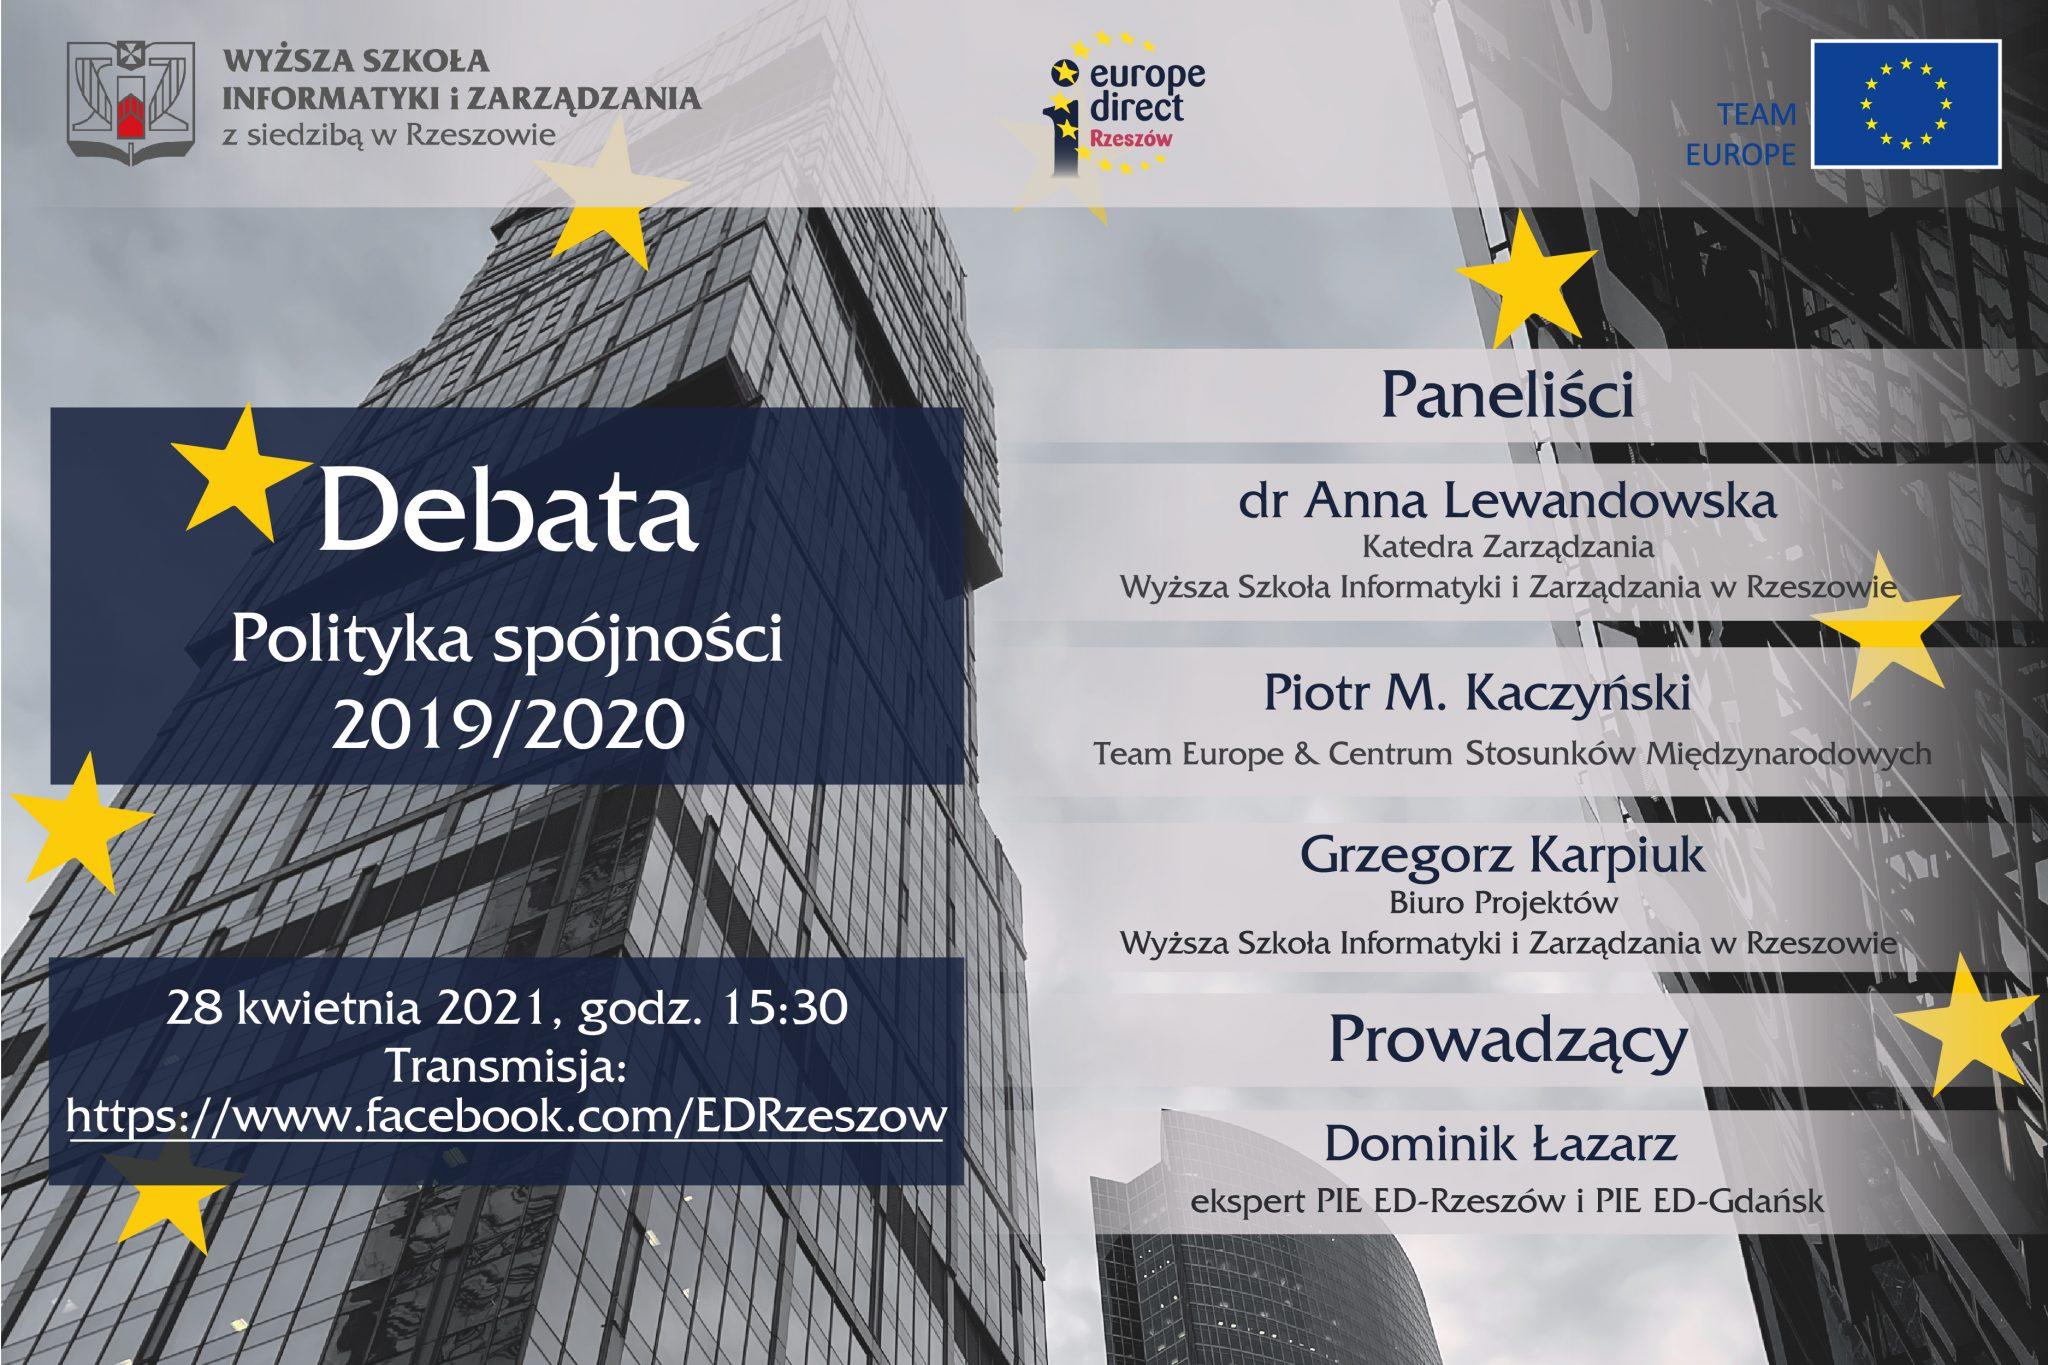 debata - Polityka spójności